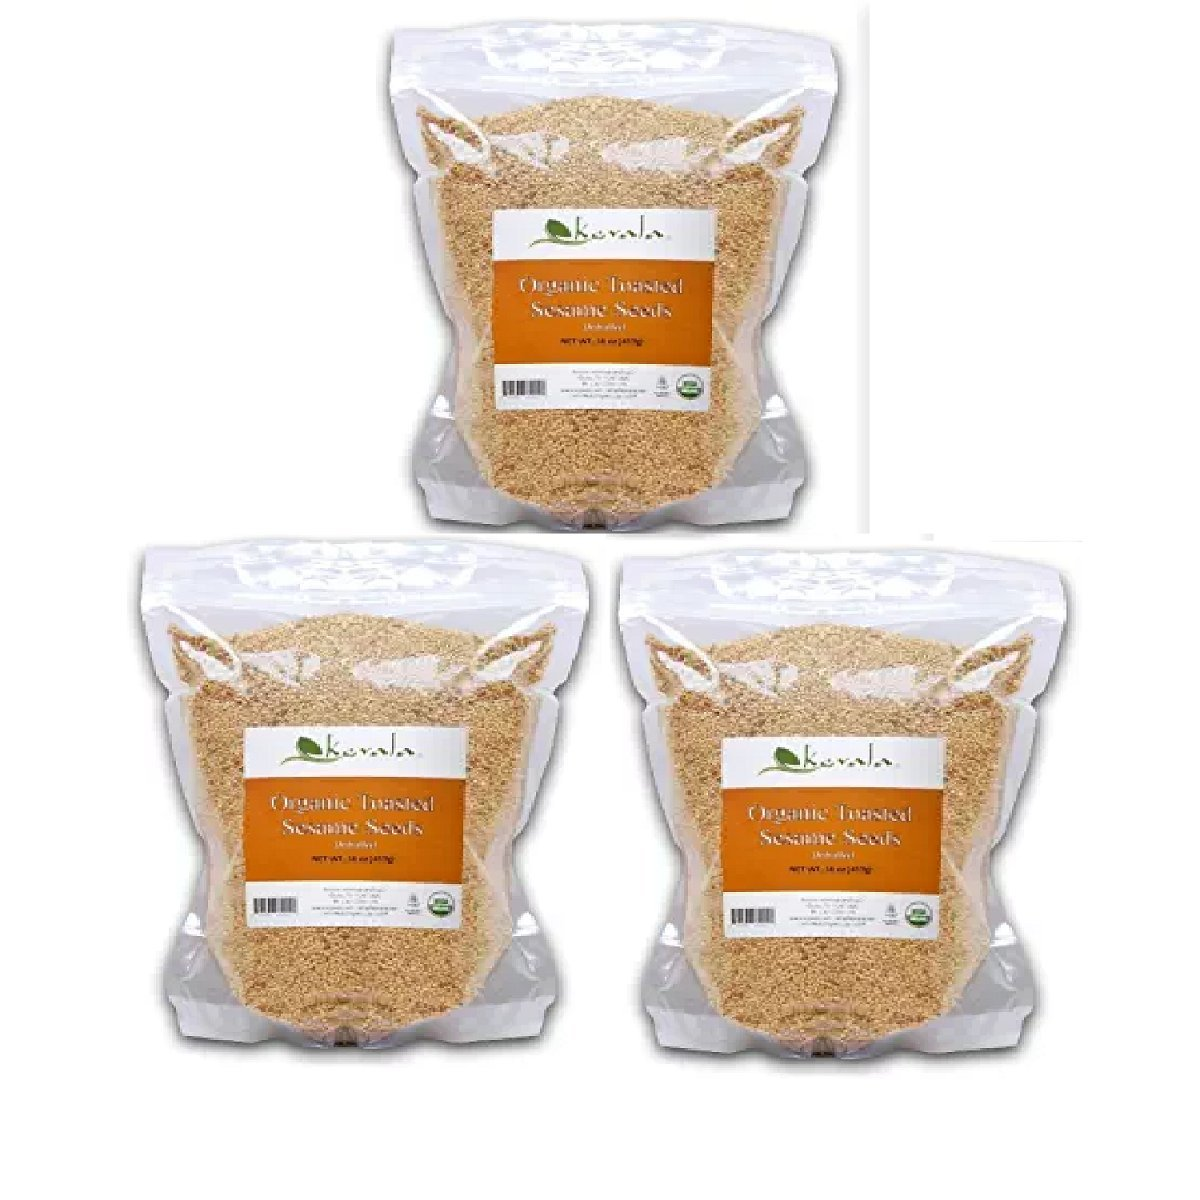 Kevala Organic Toasted Sesame Seeds 1Lb (3-Pack)